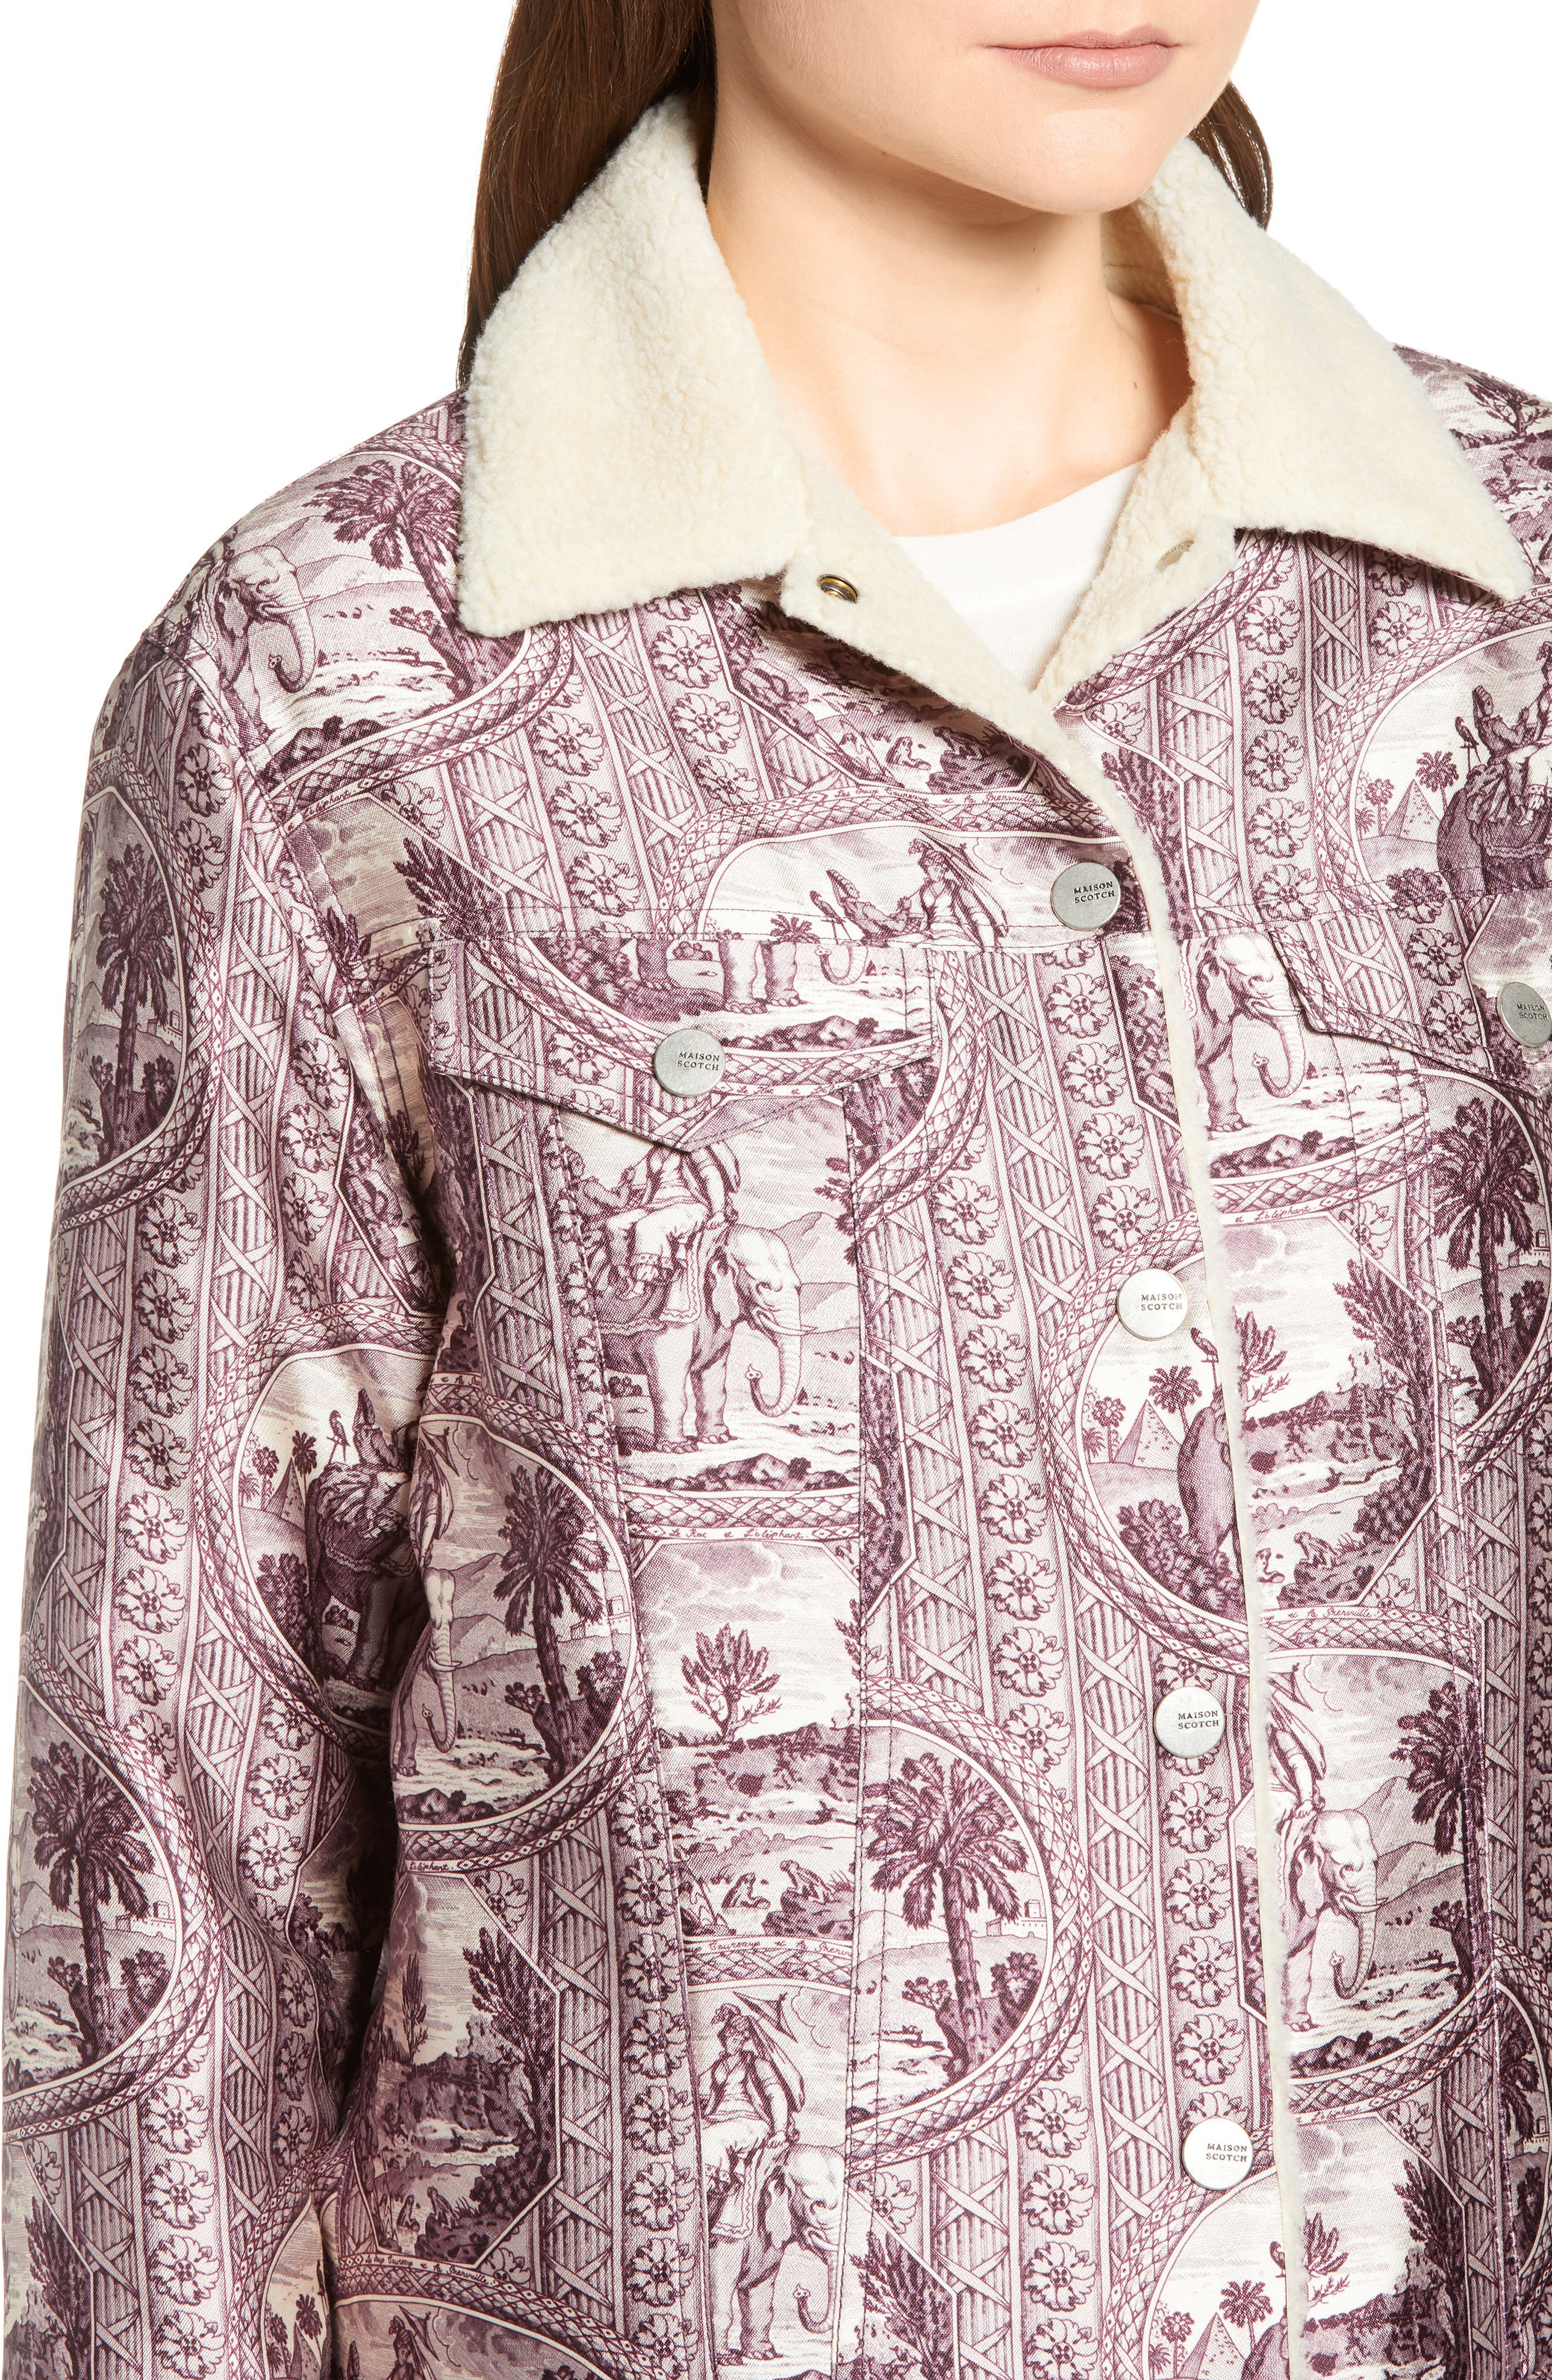 Fleece Lined Print Trucker Jacket,                             Alternate thumbnail 4, color,                             LILAC ELEPHANT PRINT